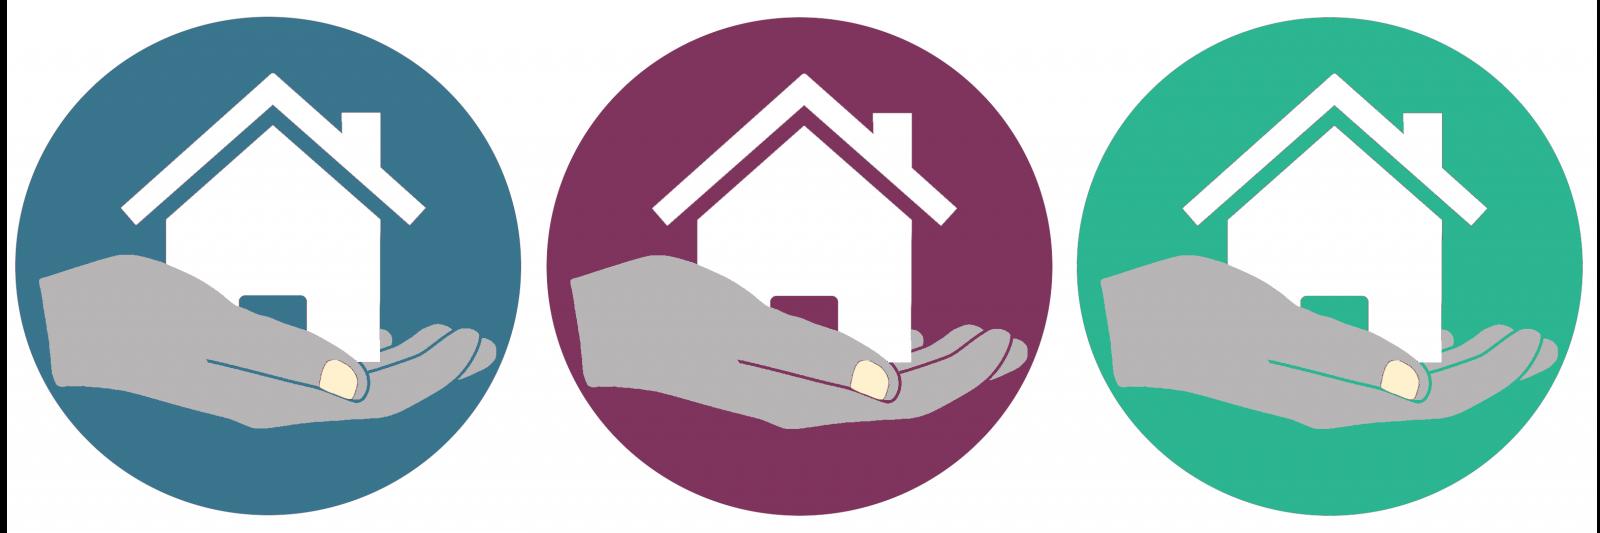 Hands holding house logo